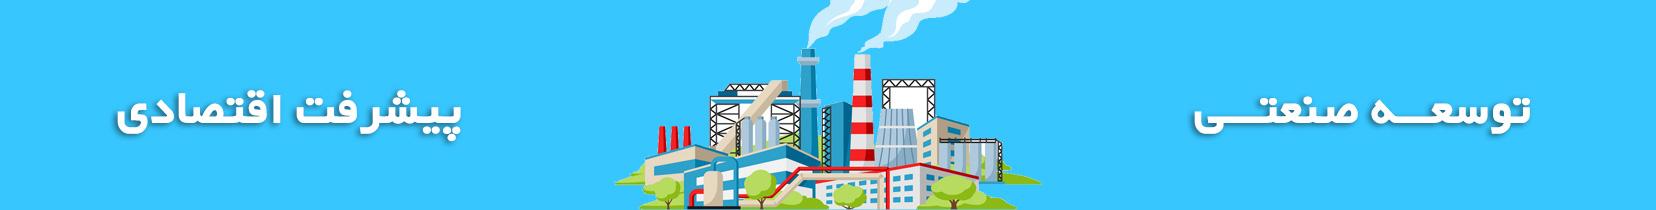 توسعه صنعتی - پیشرفت اقتصادی